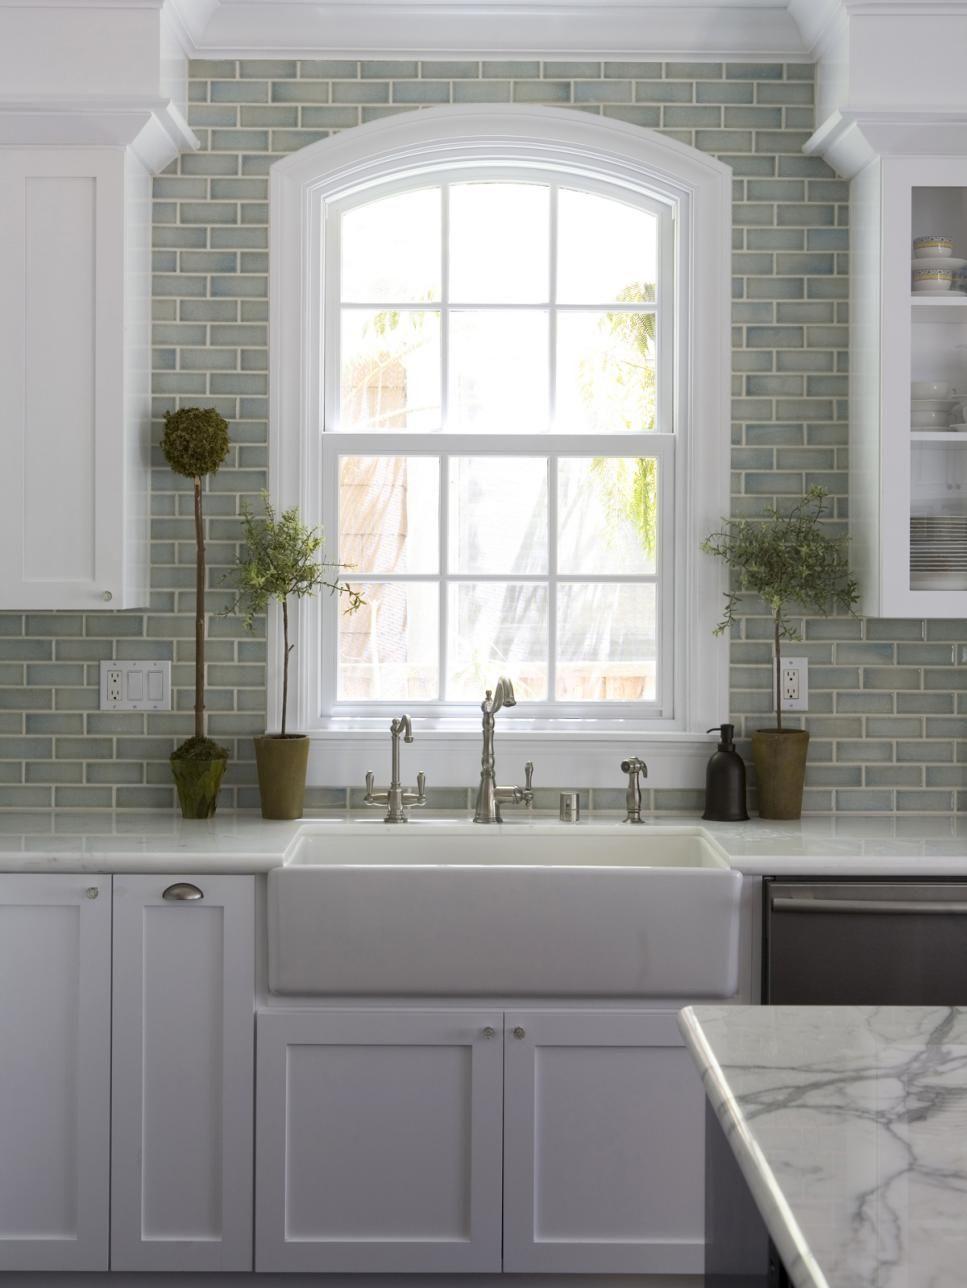 Hgtv has dozens of pictures of beautiful kitchen backsplash ideas